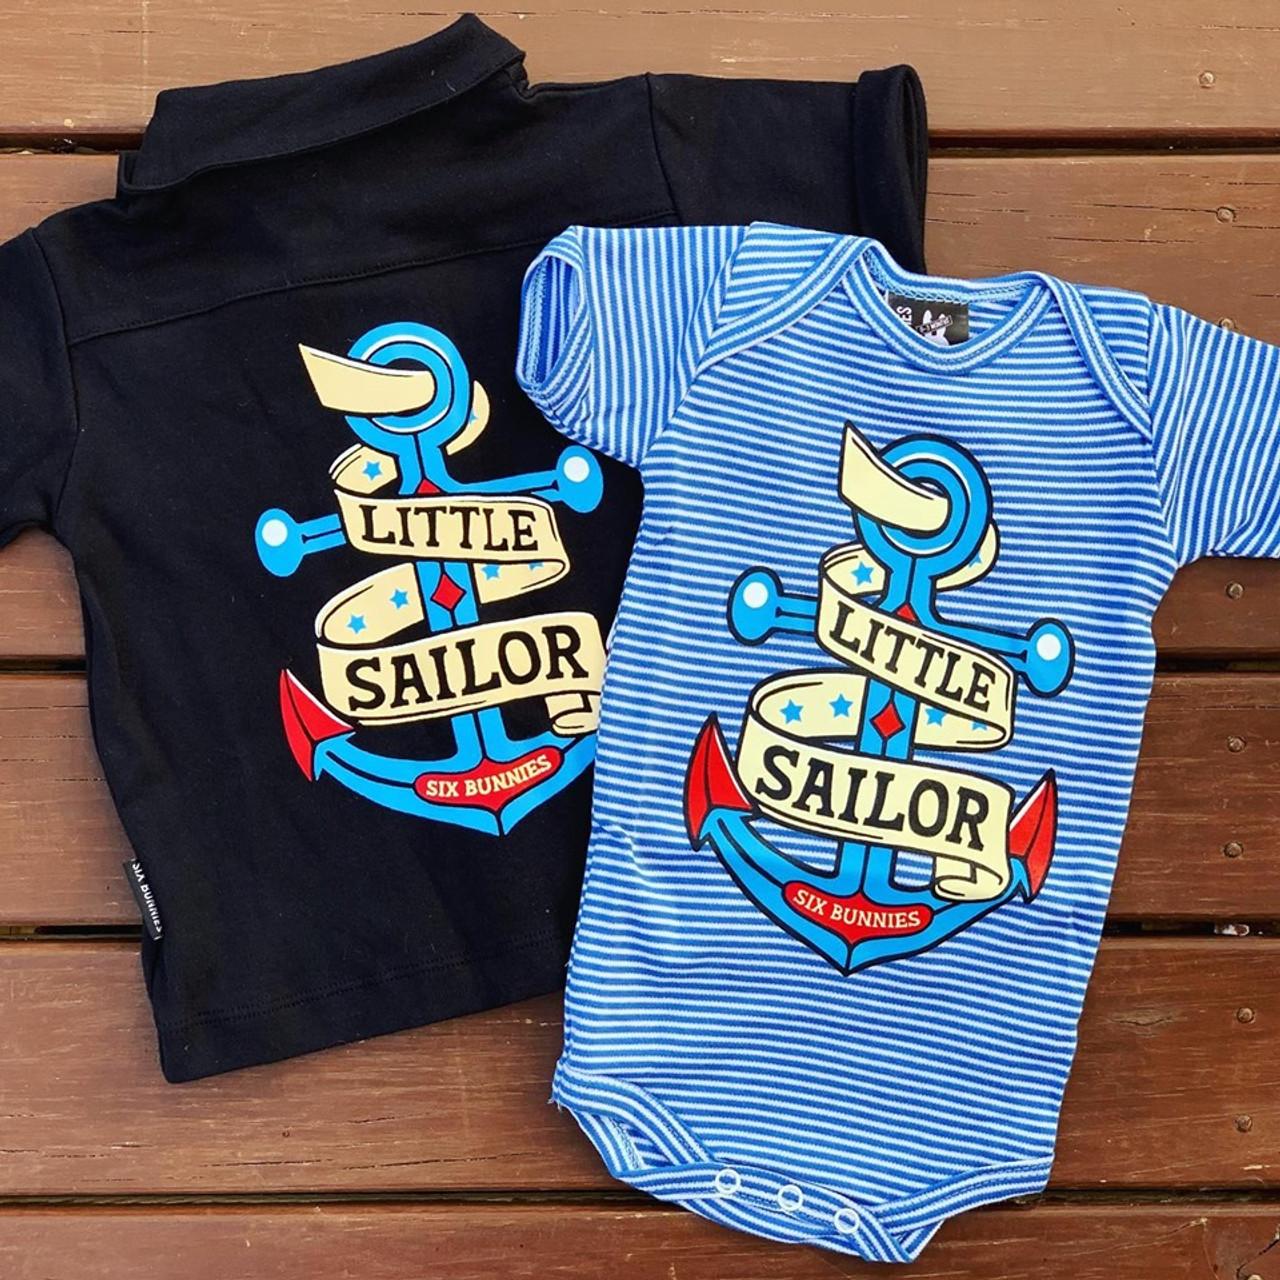 Six Bunnies Little Sailor Romper OnePiece Punk Tattoo Nautical Baby AnchorShower